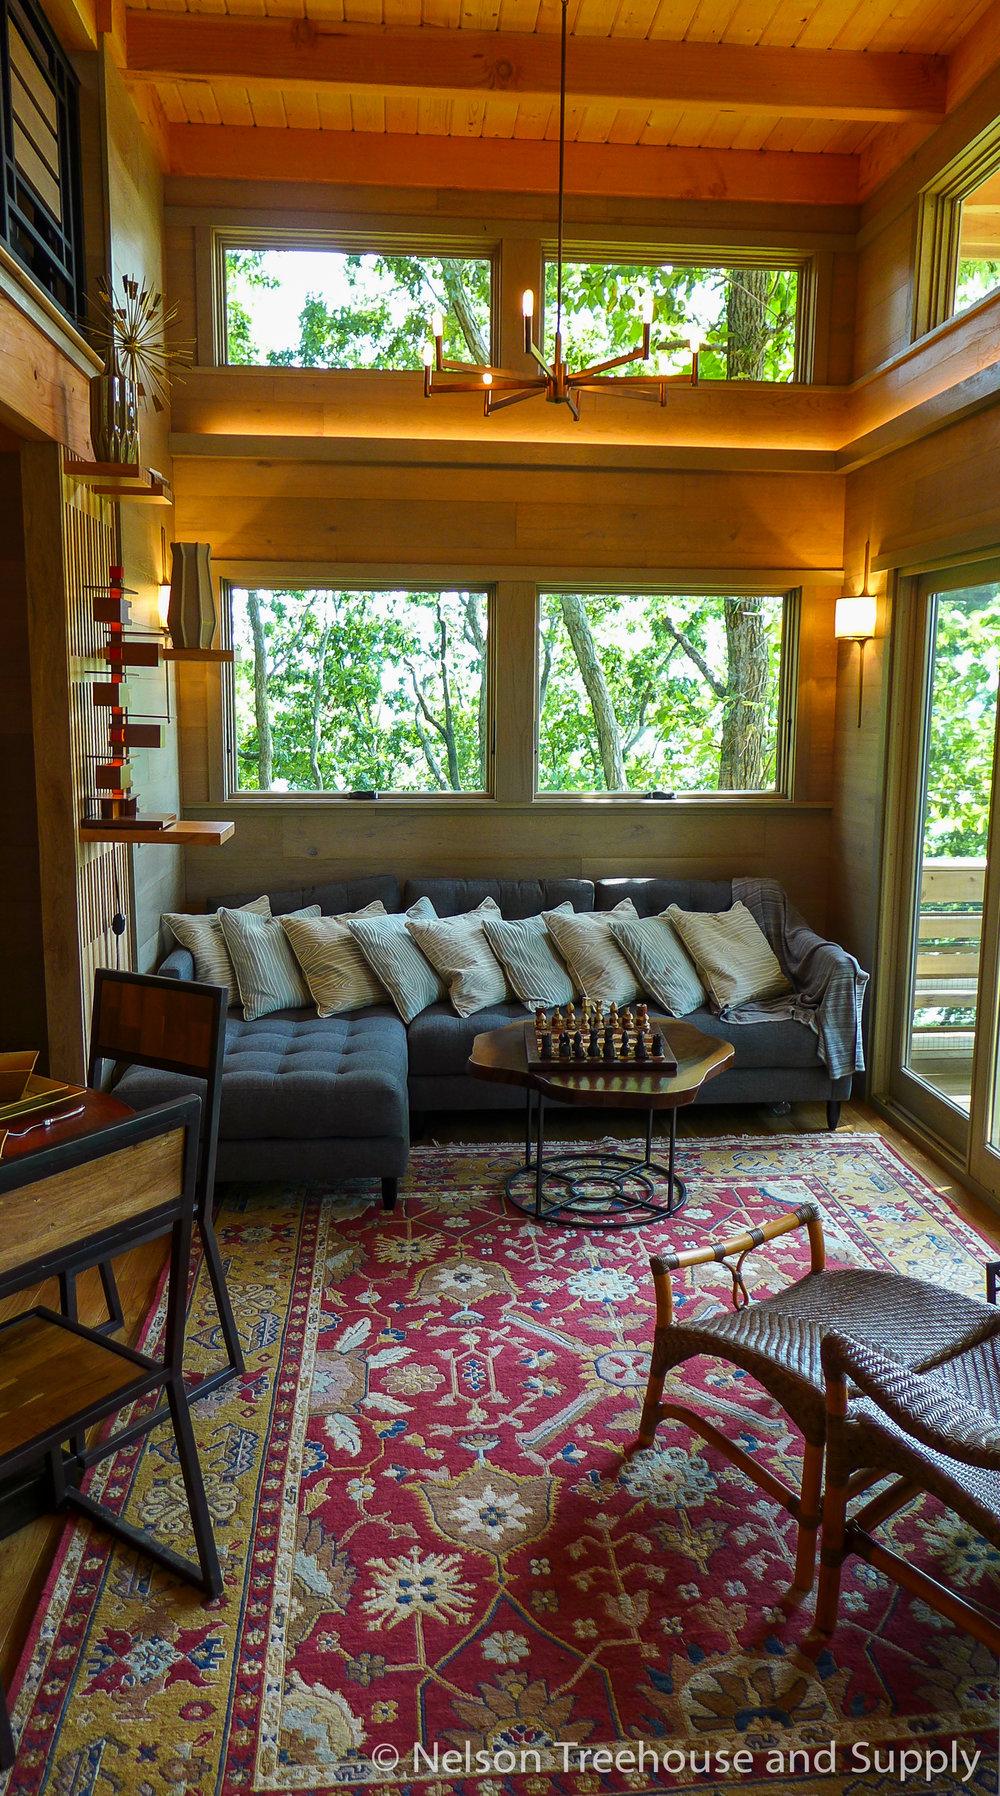 frank-lloyd-wright-treehouse-living room